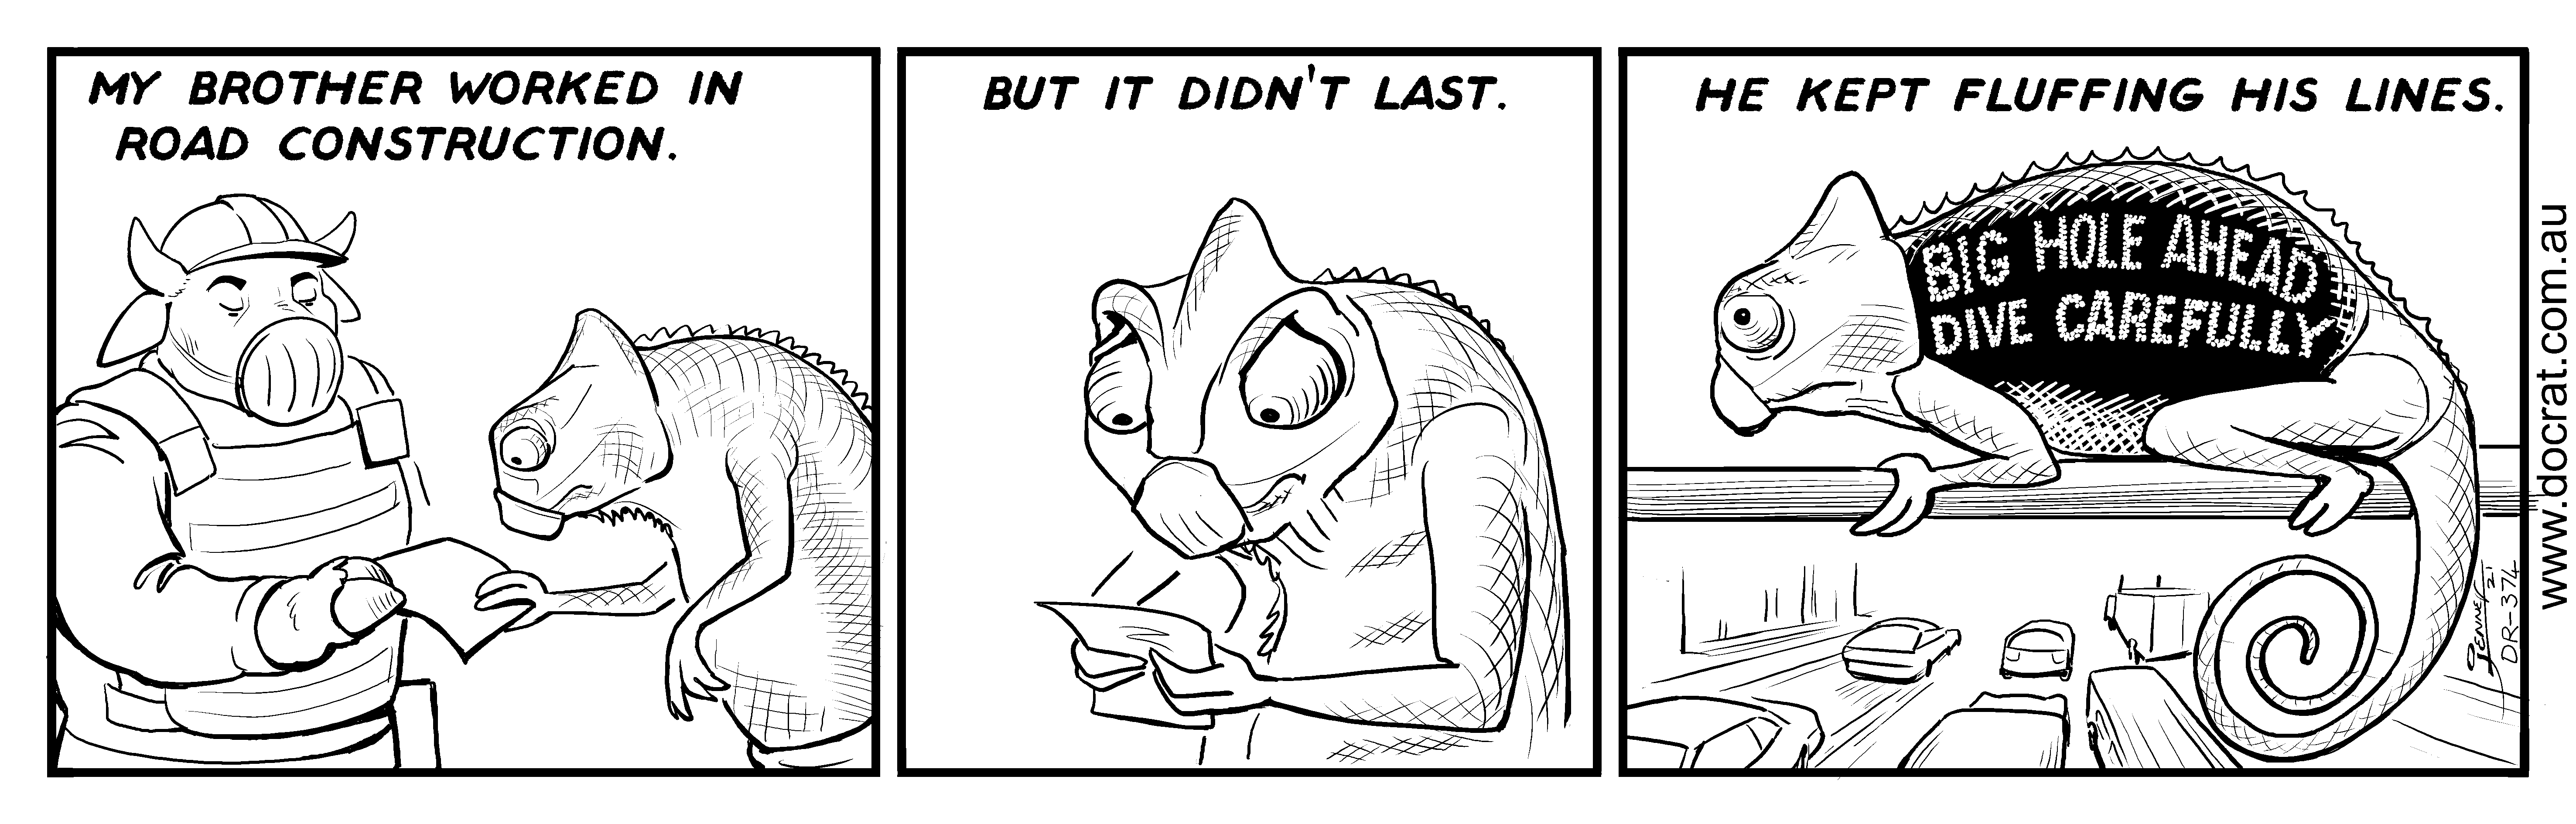 20210526